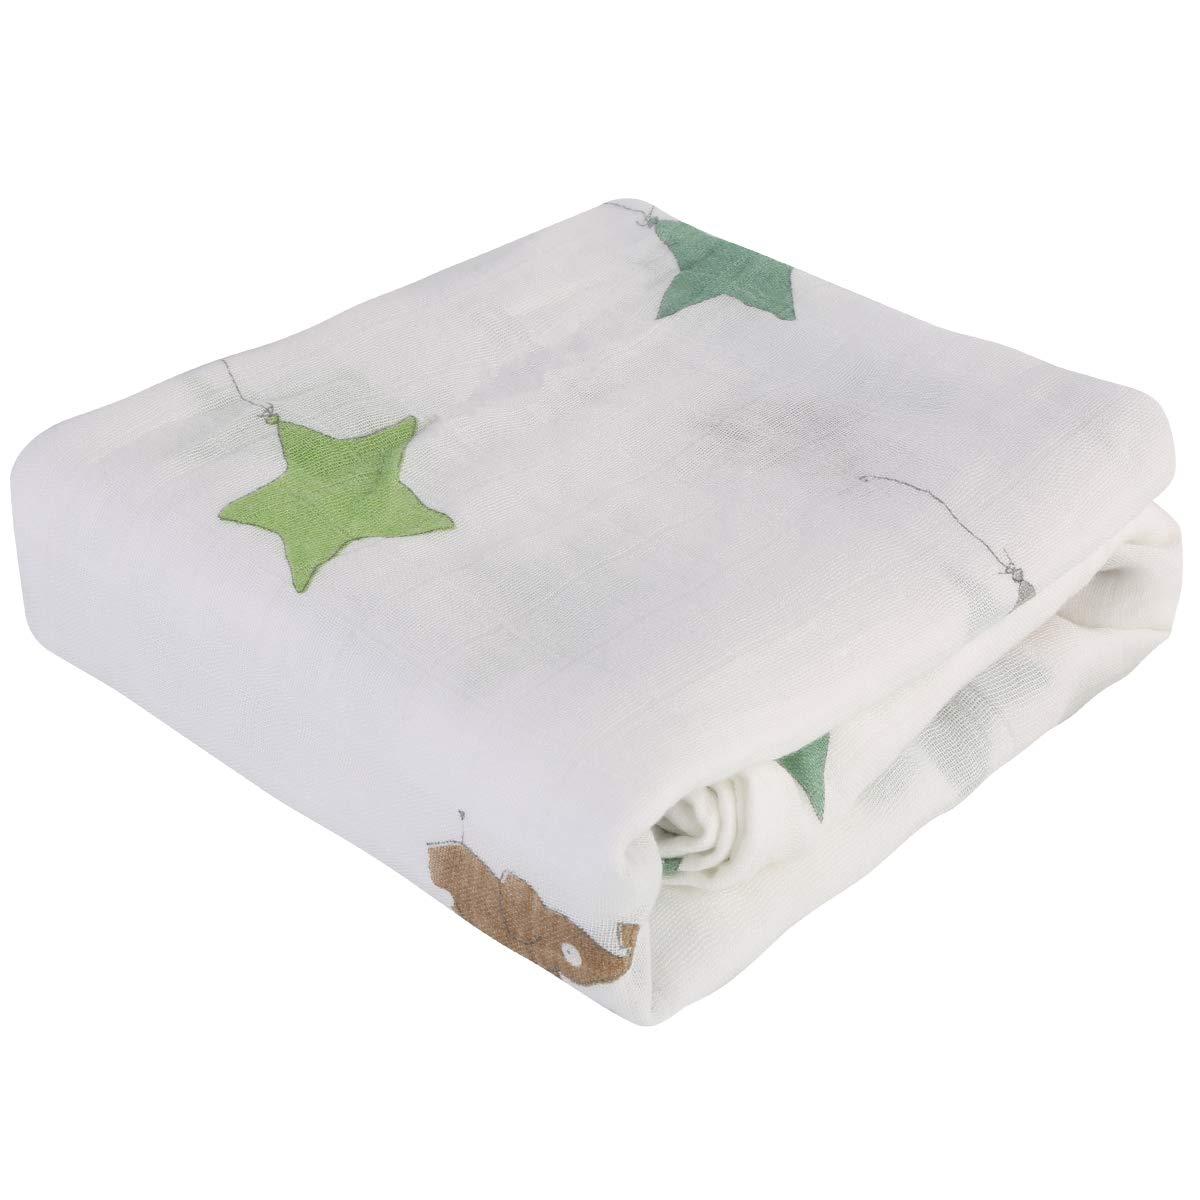 1PC Baby Swaddle Blanket Cartoon Animal Print Newborn Soft Receiving Blanket Wrap Bath Towel for Infant Boys Girls 47 x 47 in(Stars Elephant)